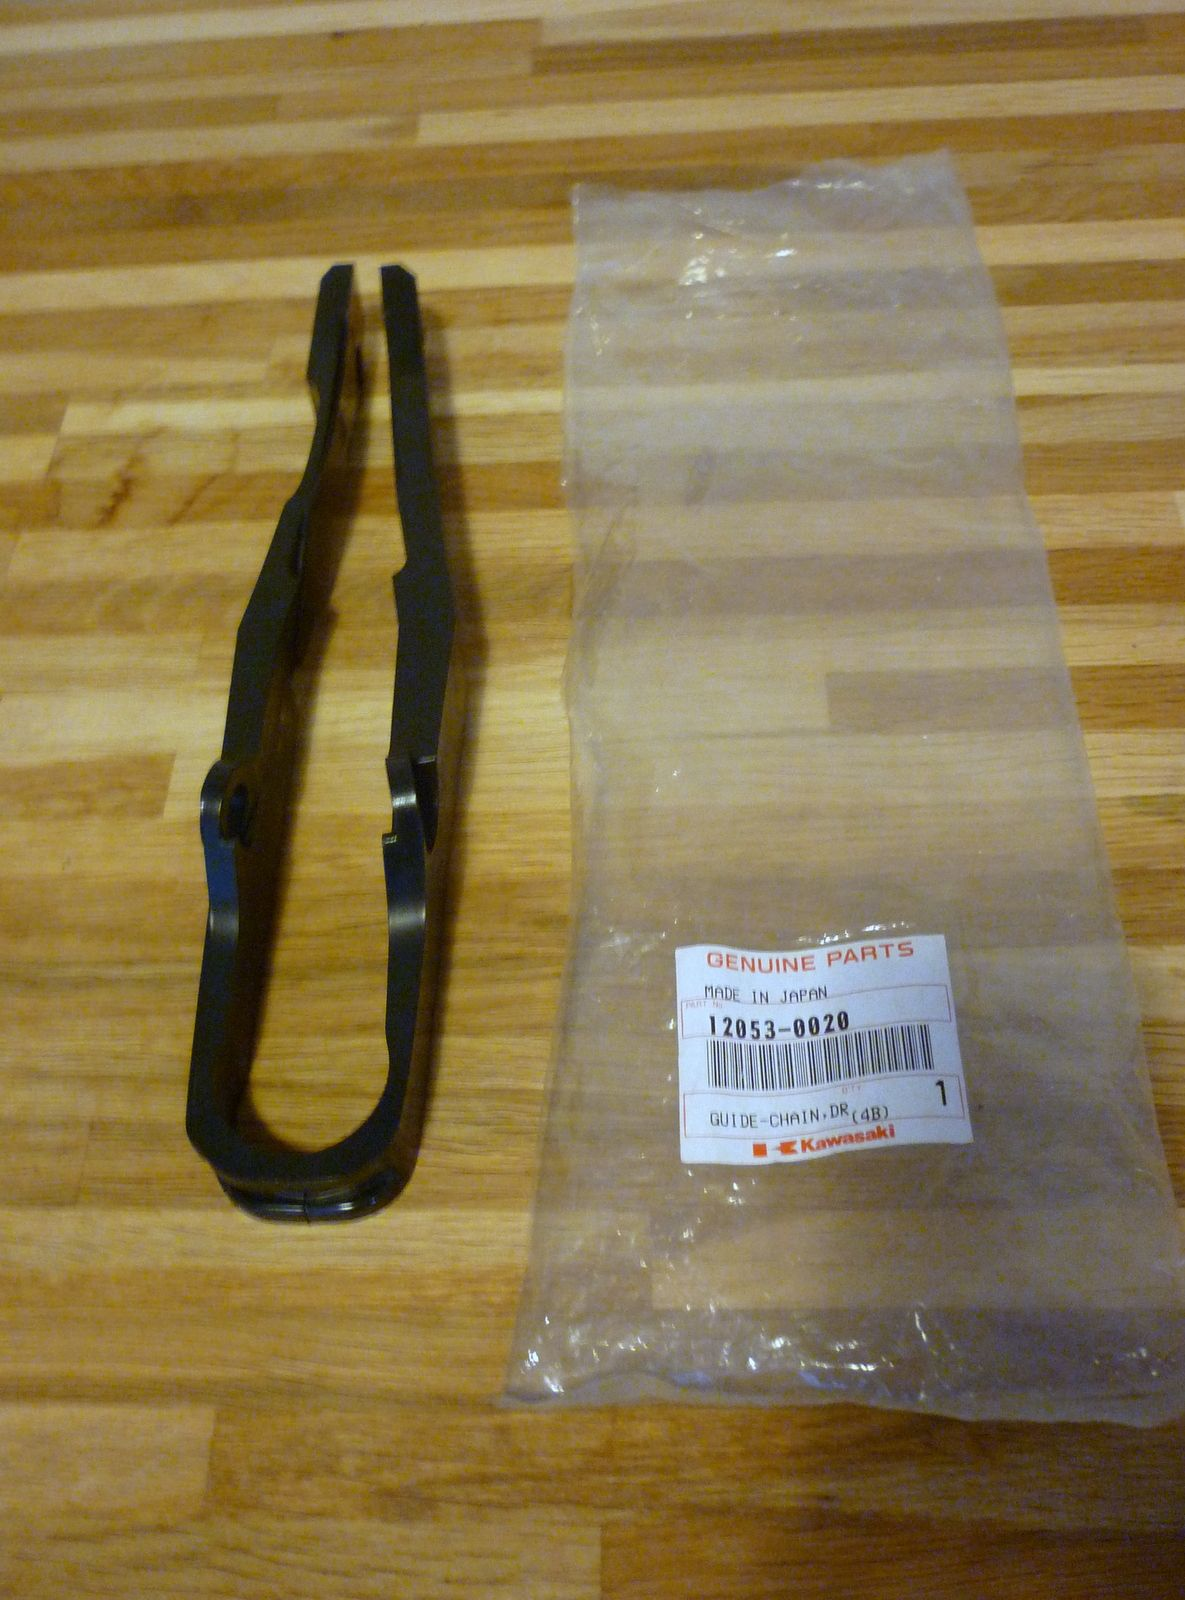 CHAIN GUIDE SLIPPER 12053-0020 (710)